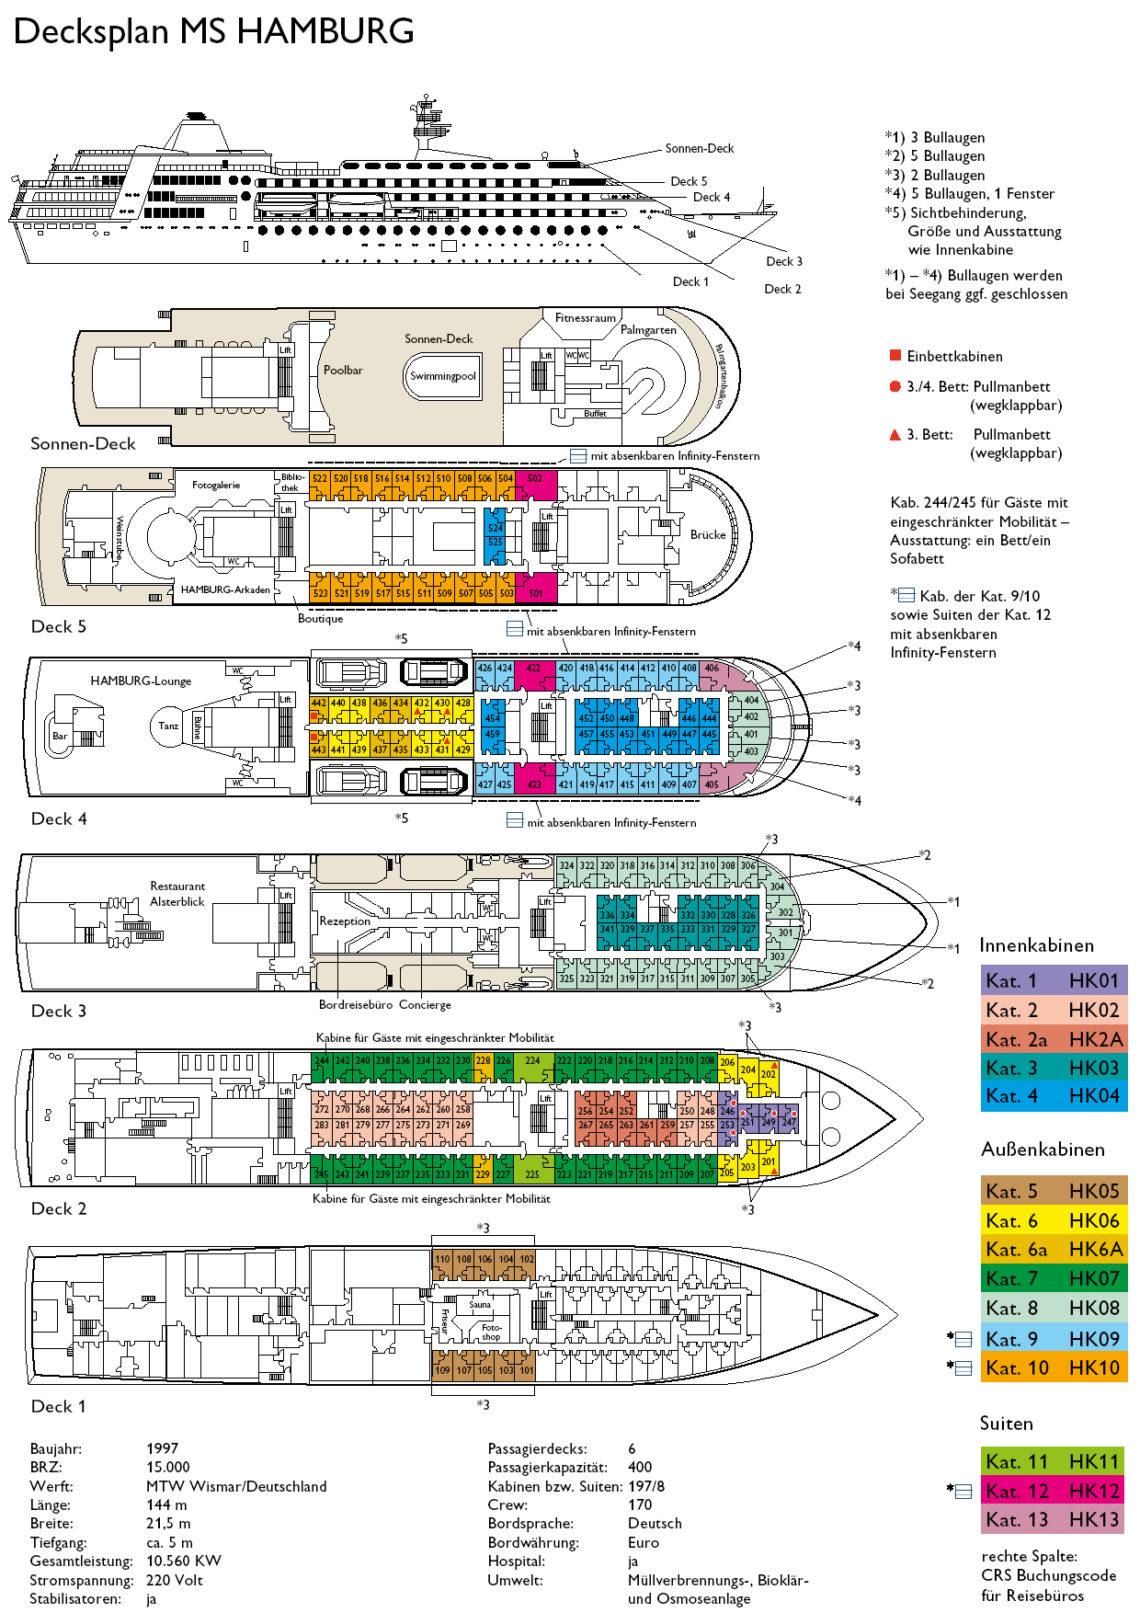 Decksplan_MS Hamburg_2020